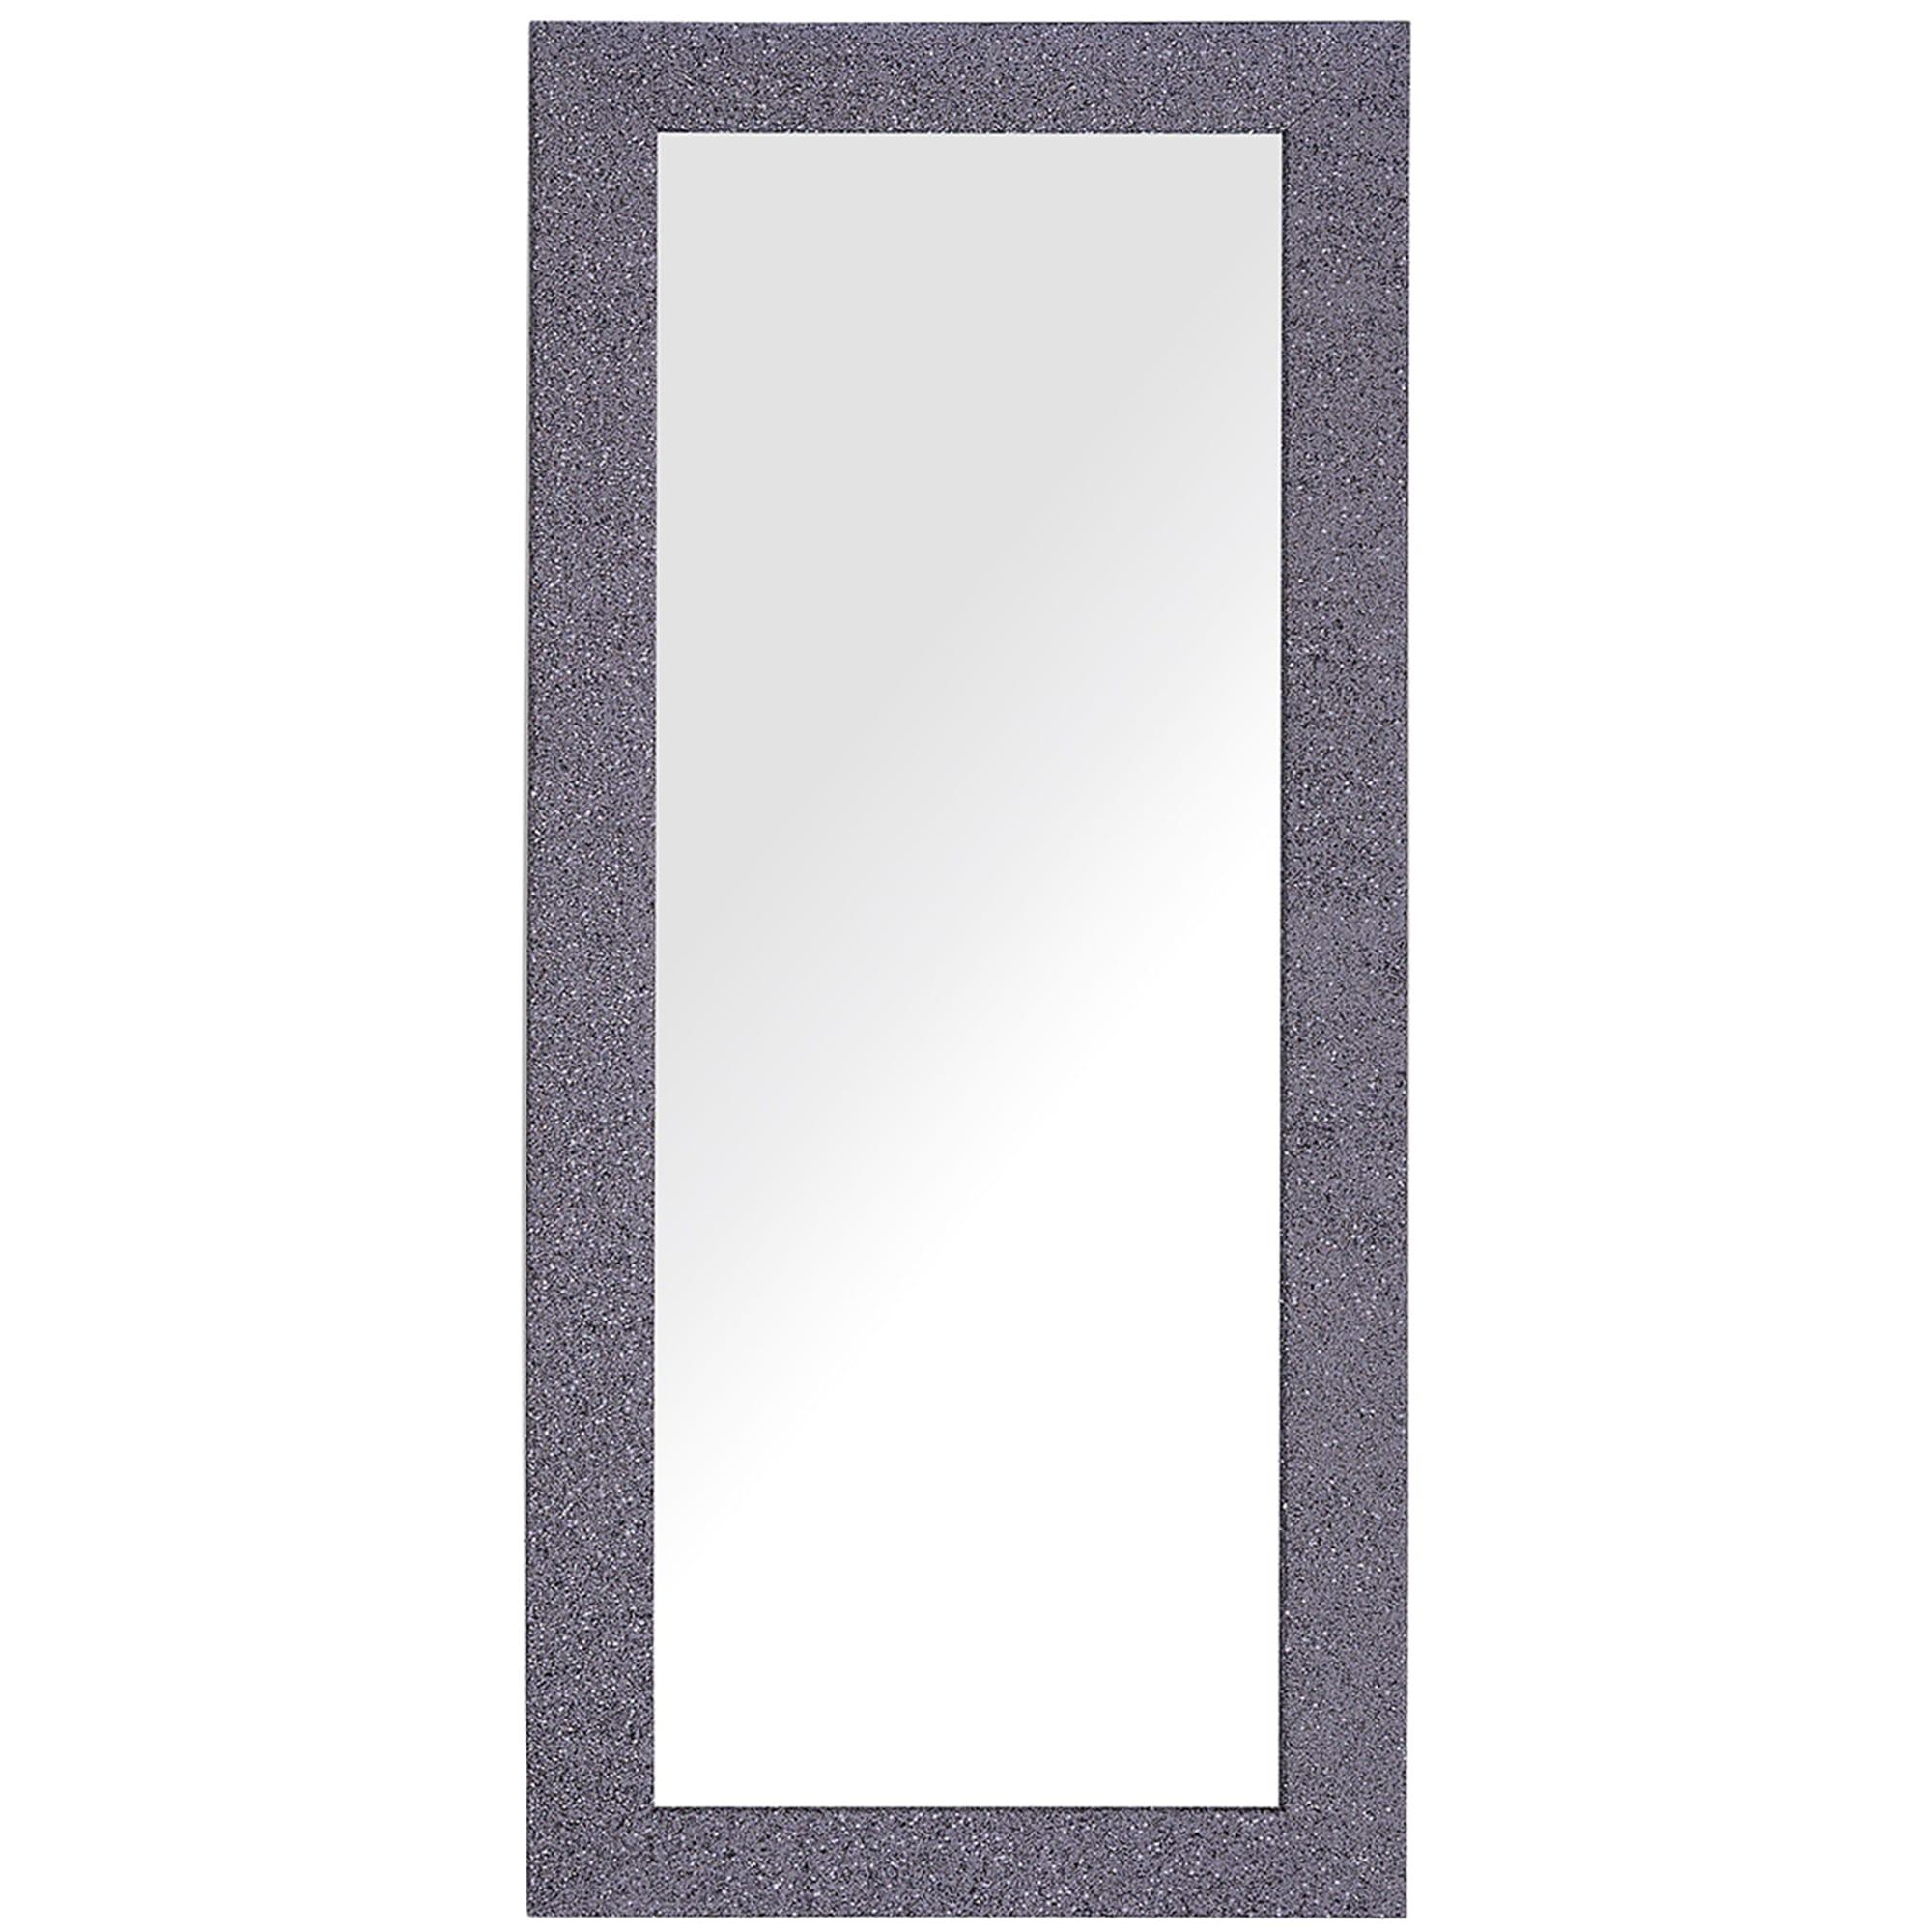 Miroir mural gris lilas 50 x 130 cm